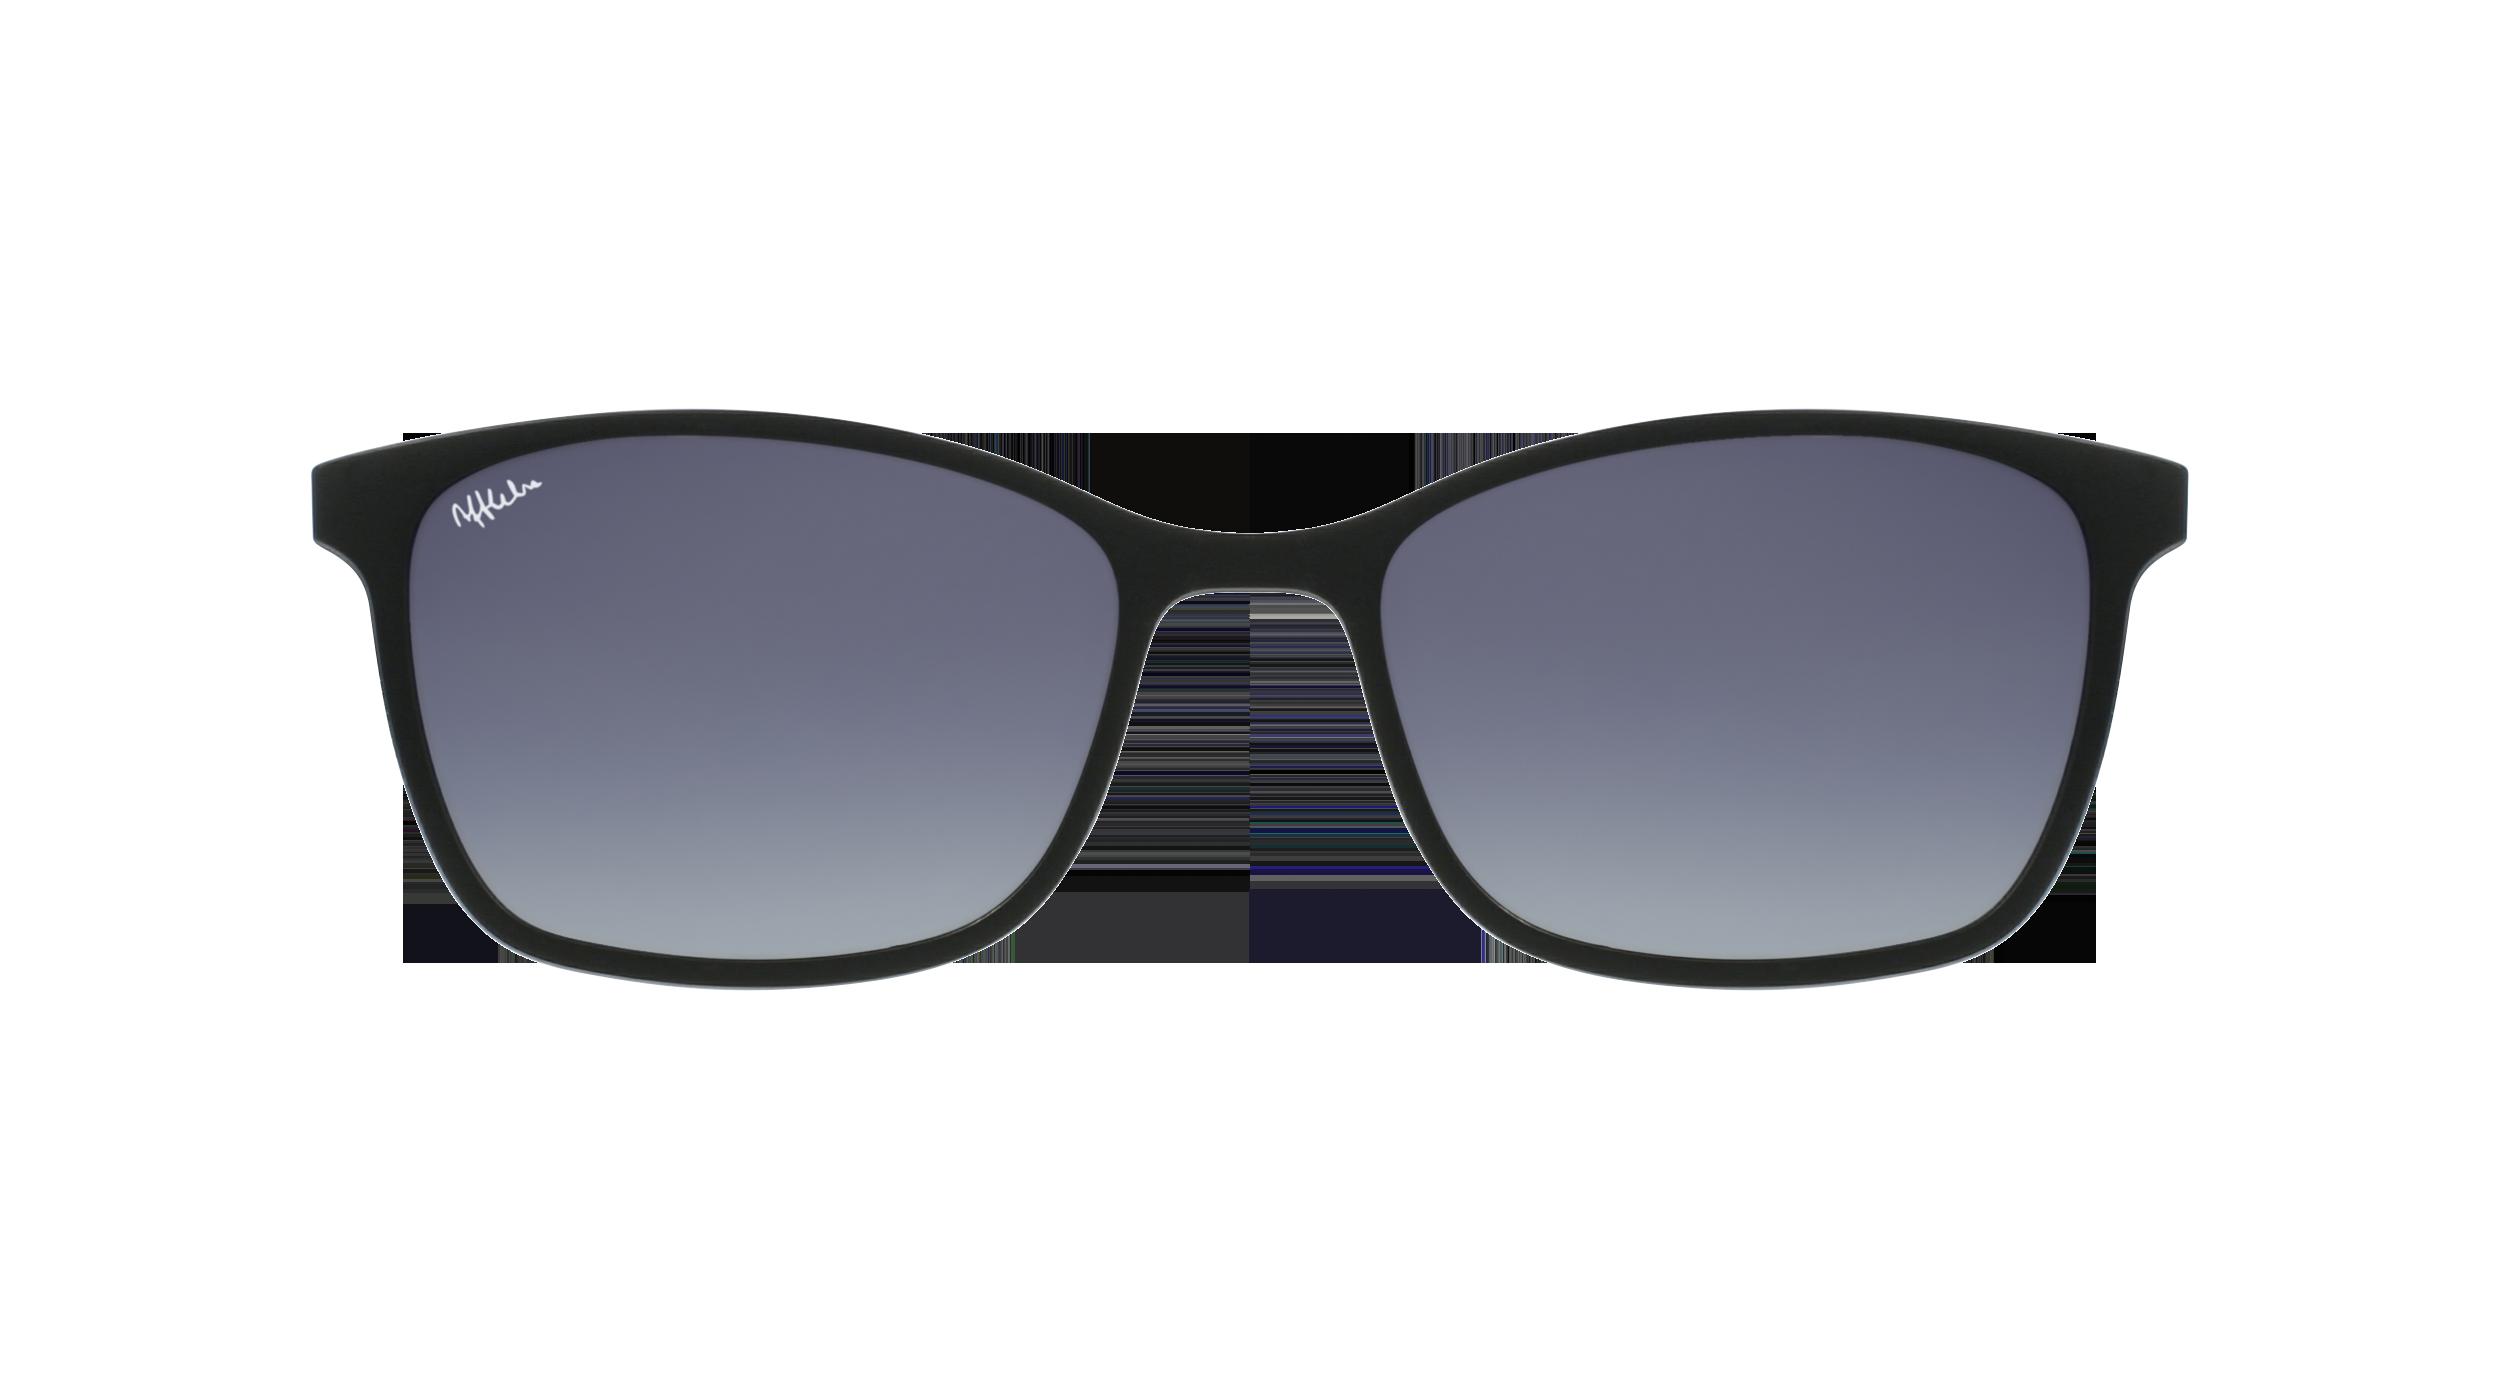 afflelou/france/products/smart_clip/clips_glasses/07630036459010.png